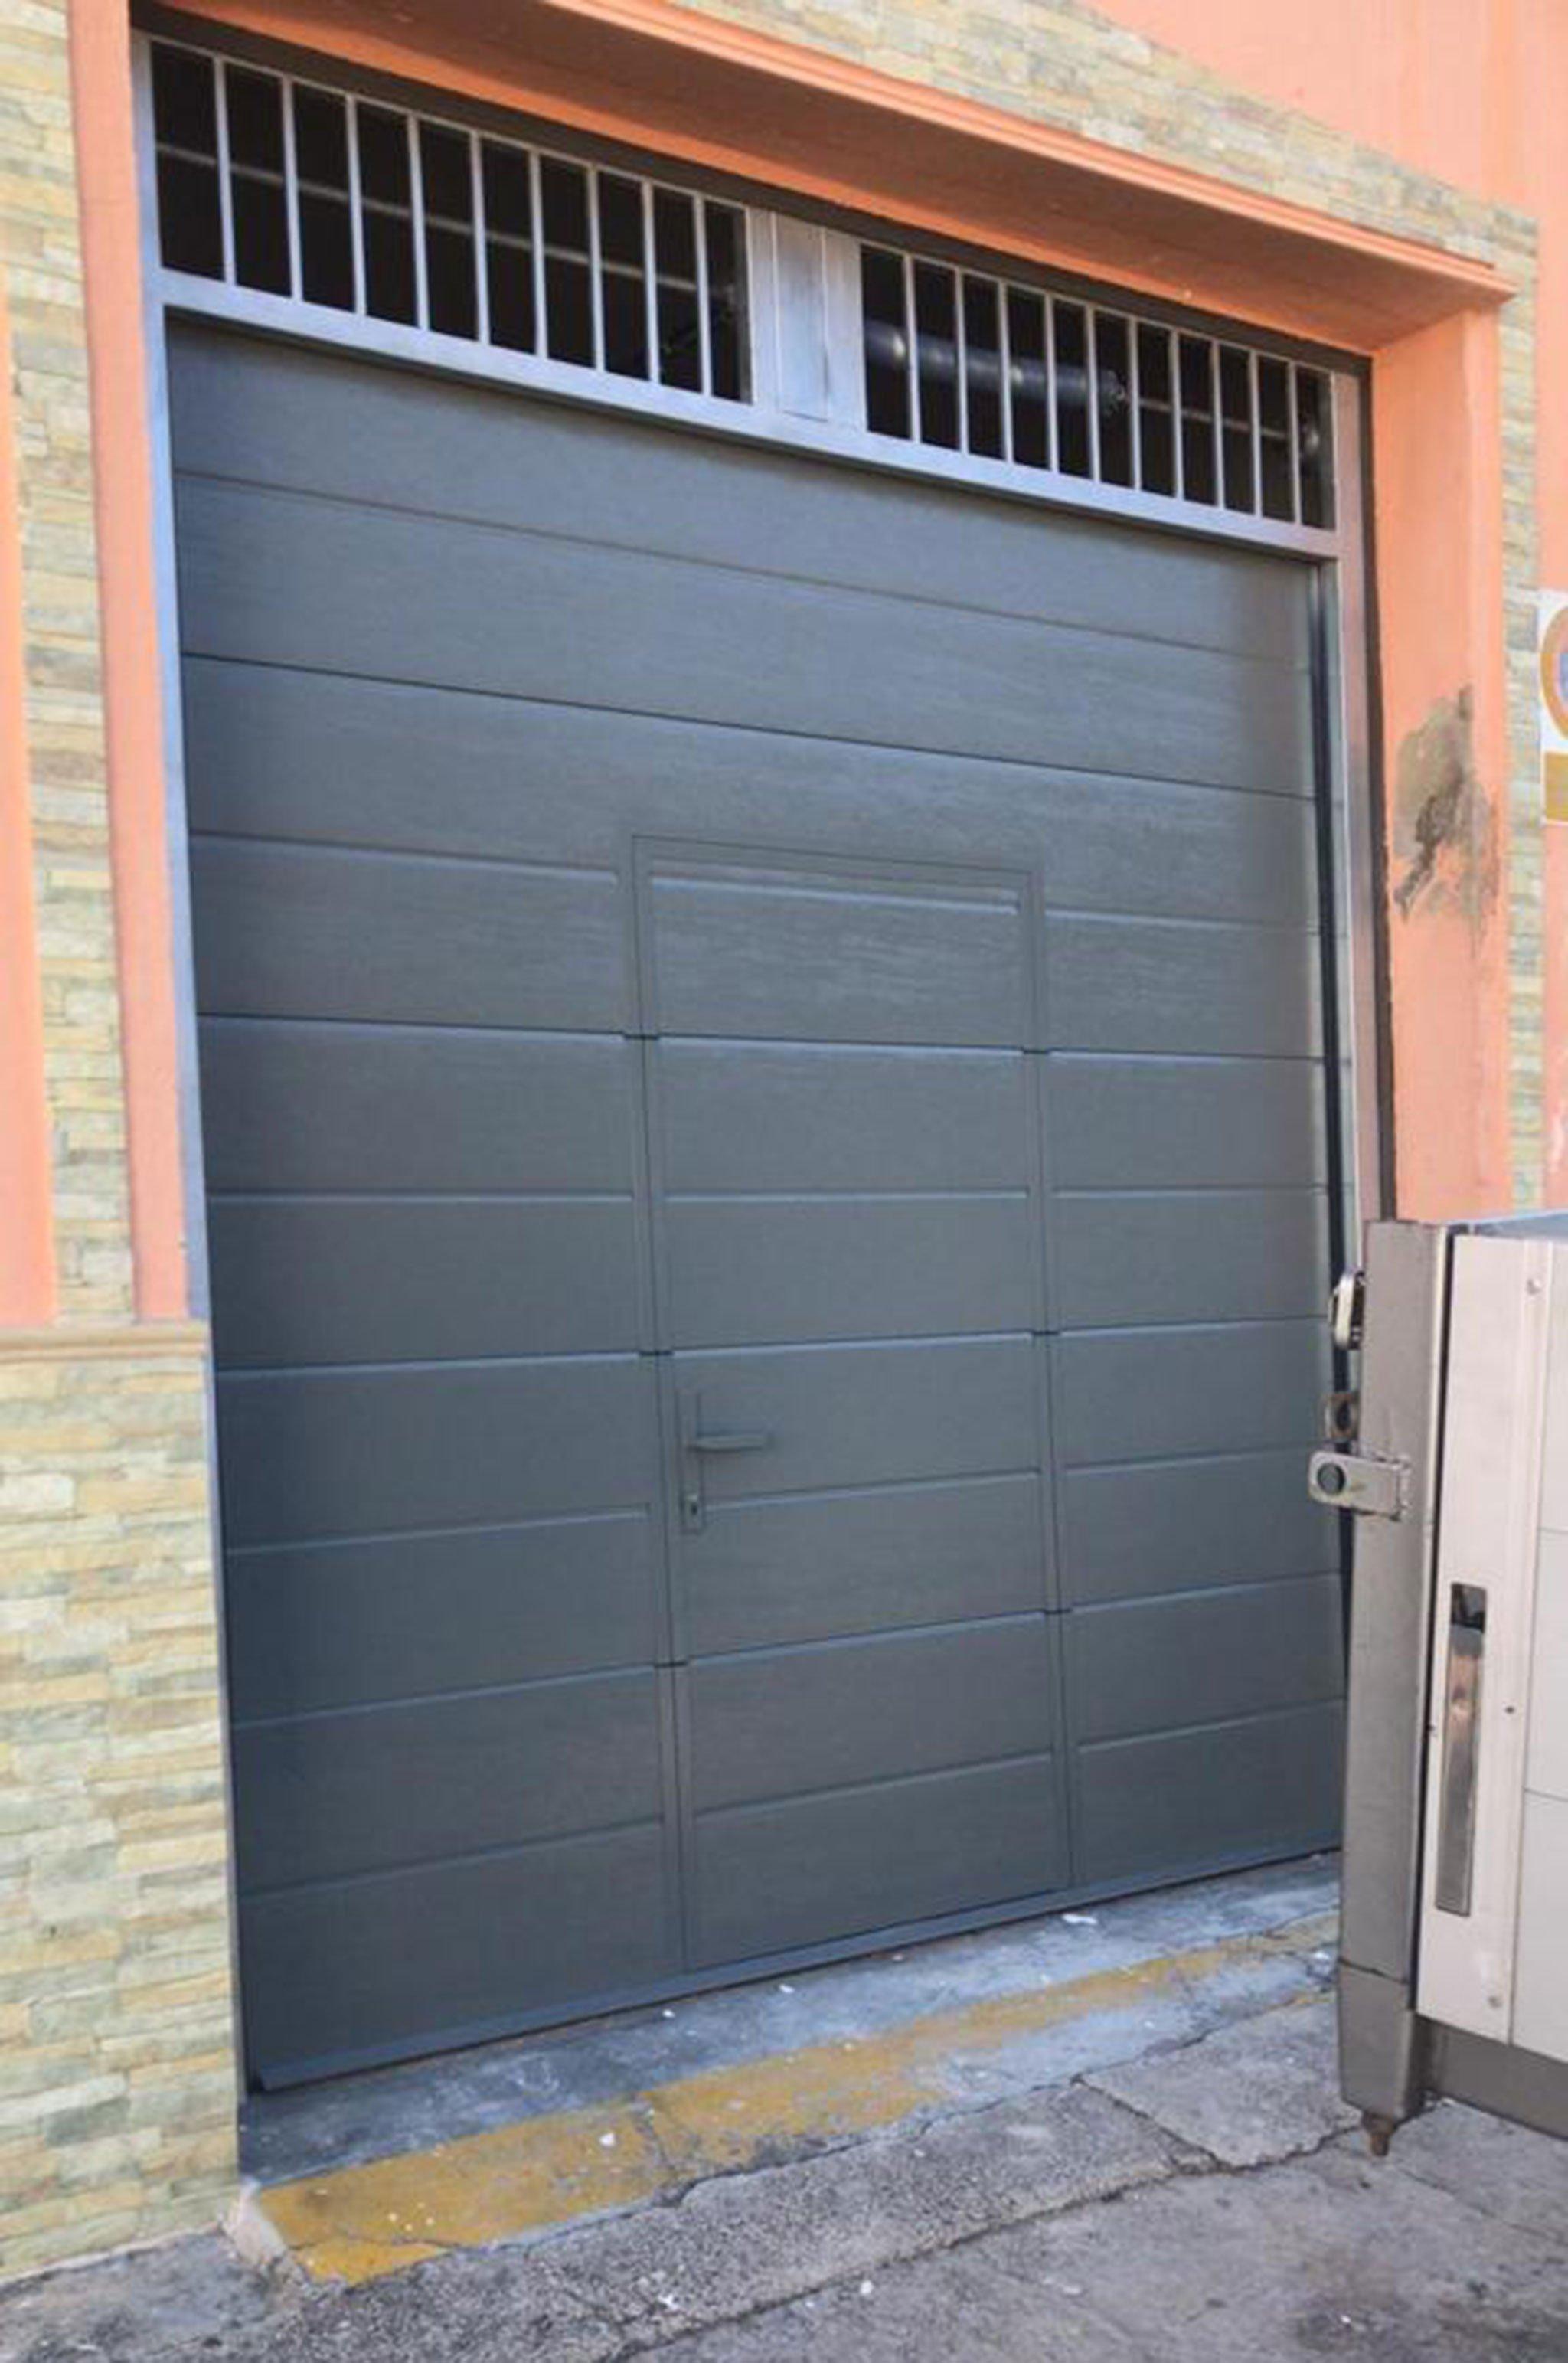 Puerta seccional en un garaje – Alucardona PVC y Aluminios S.L.